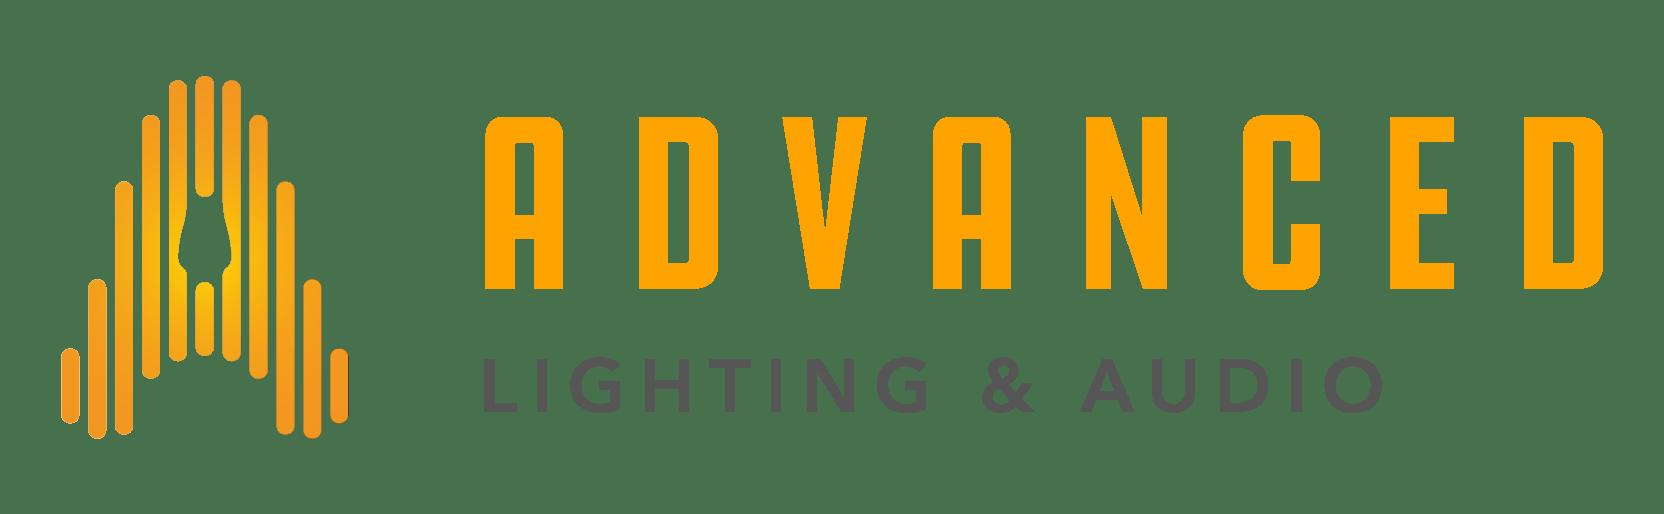 advanced lighting and audio